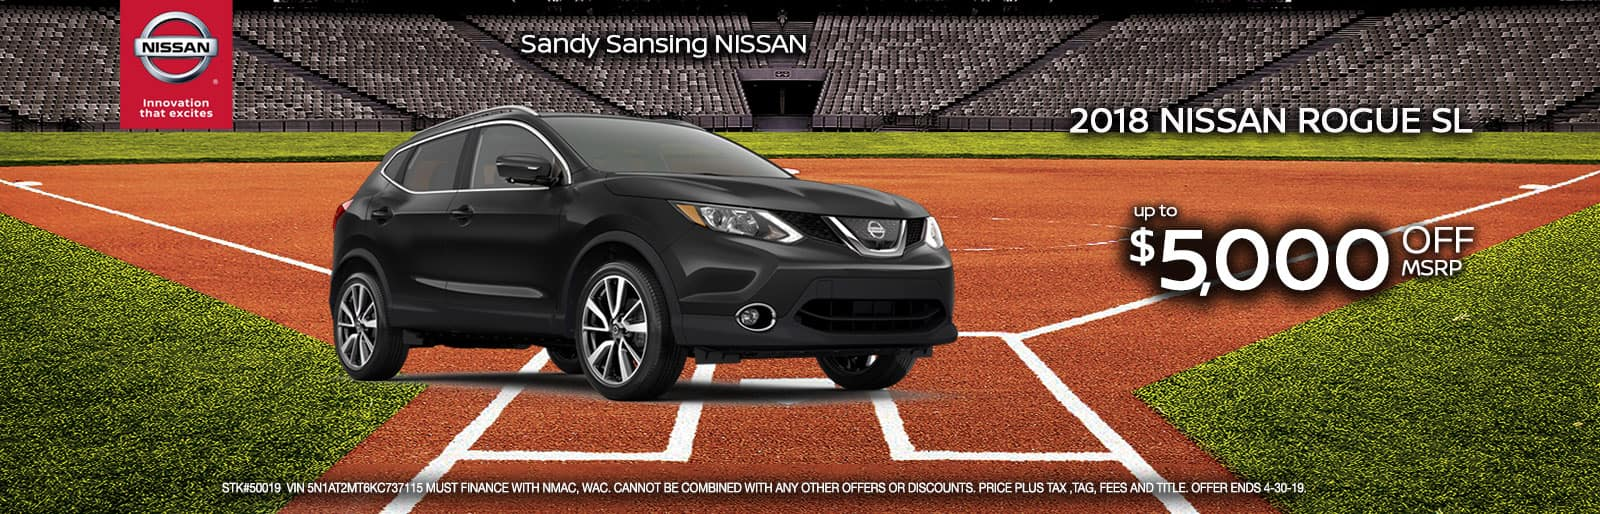 Sandy Sansing Nissan Pensacola FL Rogue